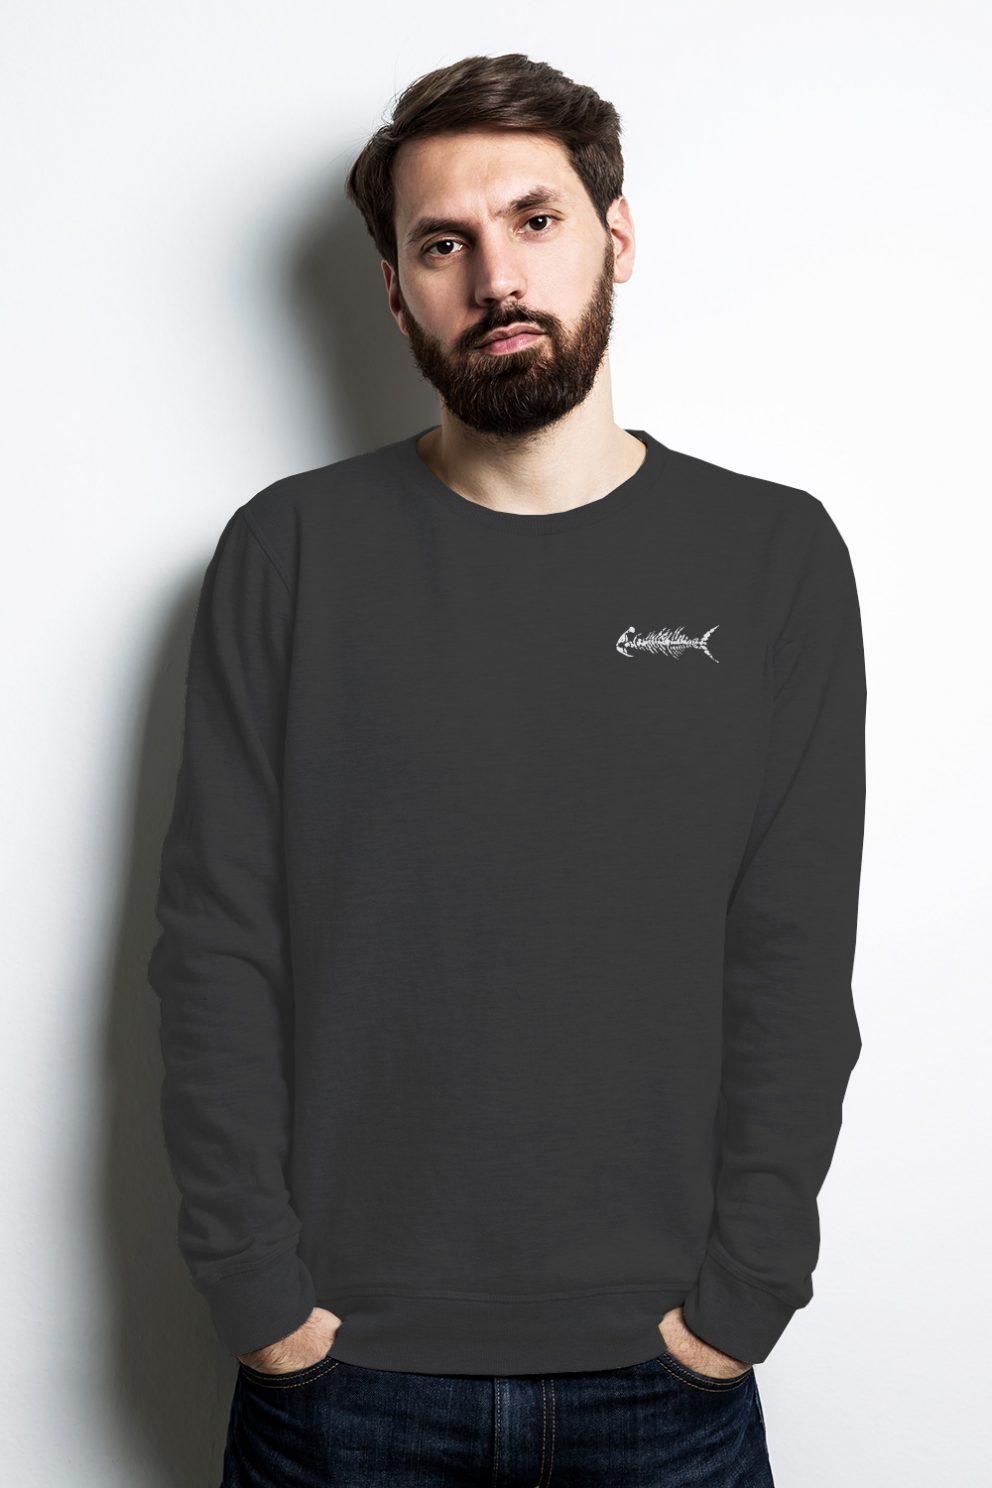 Kyst-shirt Lyngor Sweatshirt